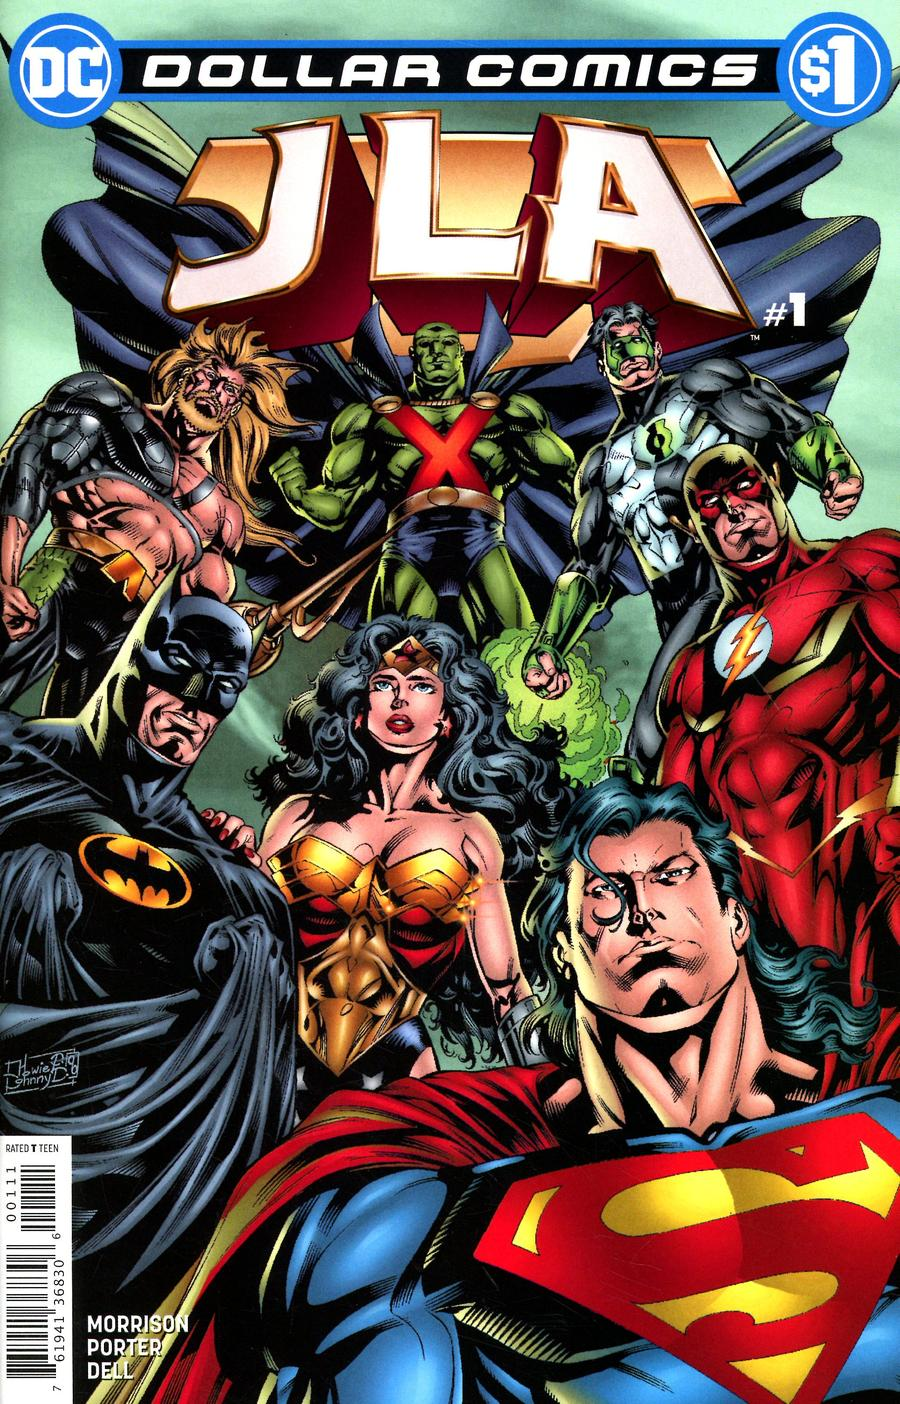 Dollar Comics JLA #1